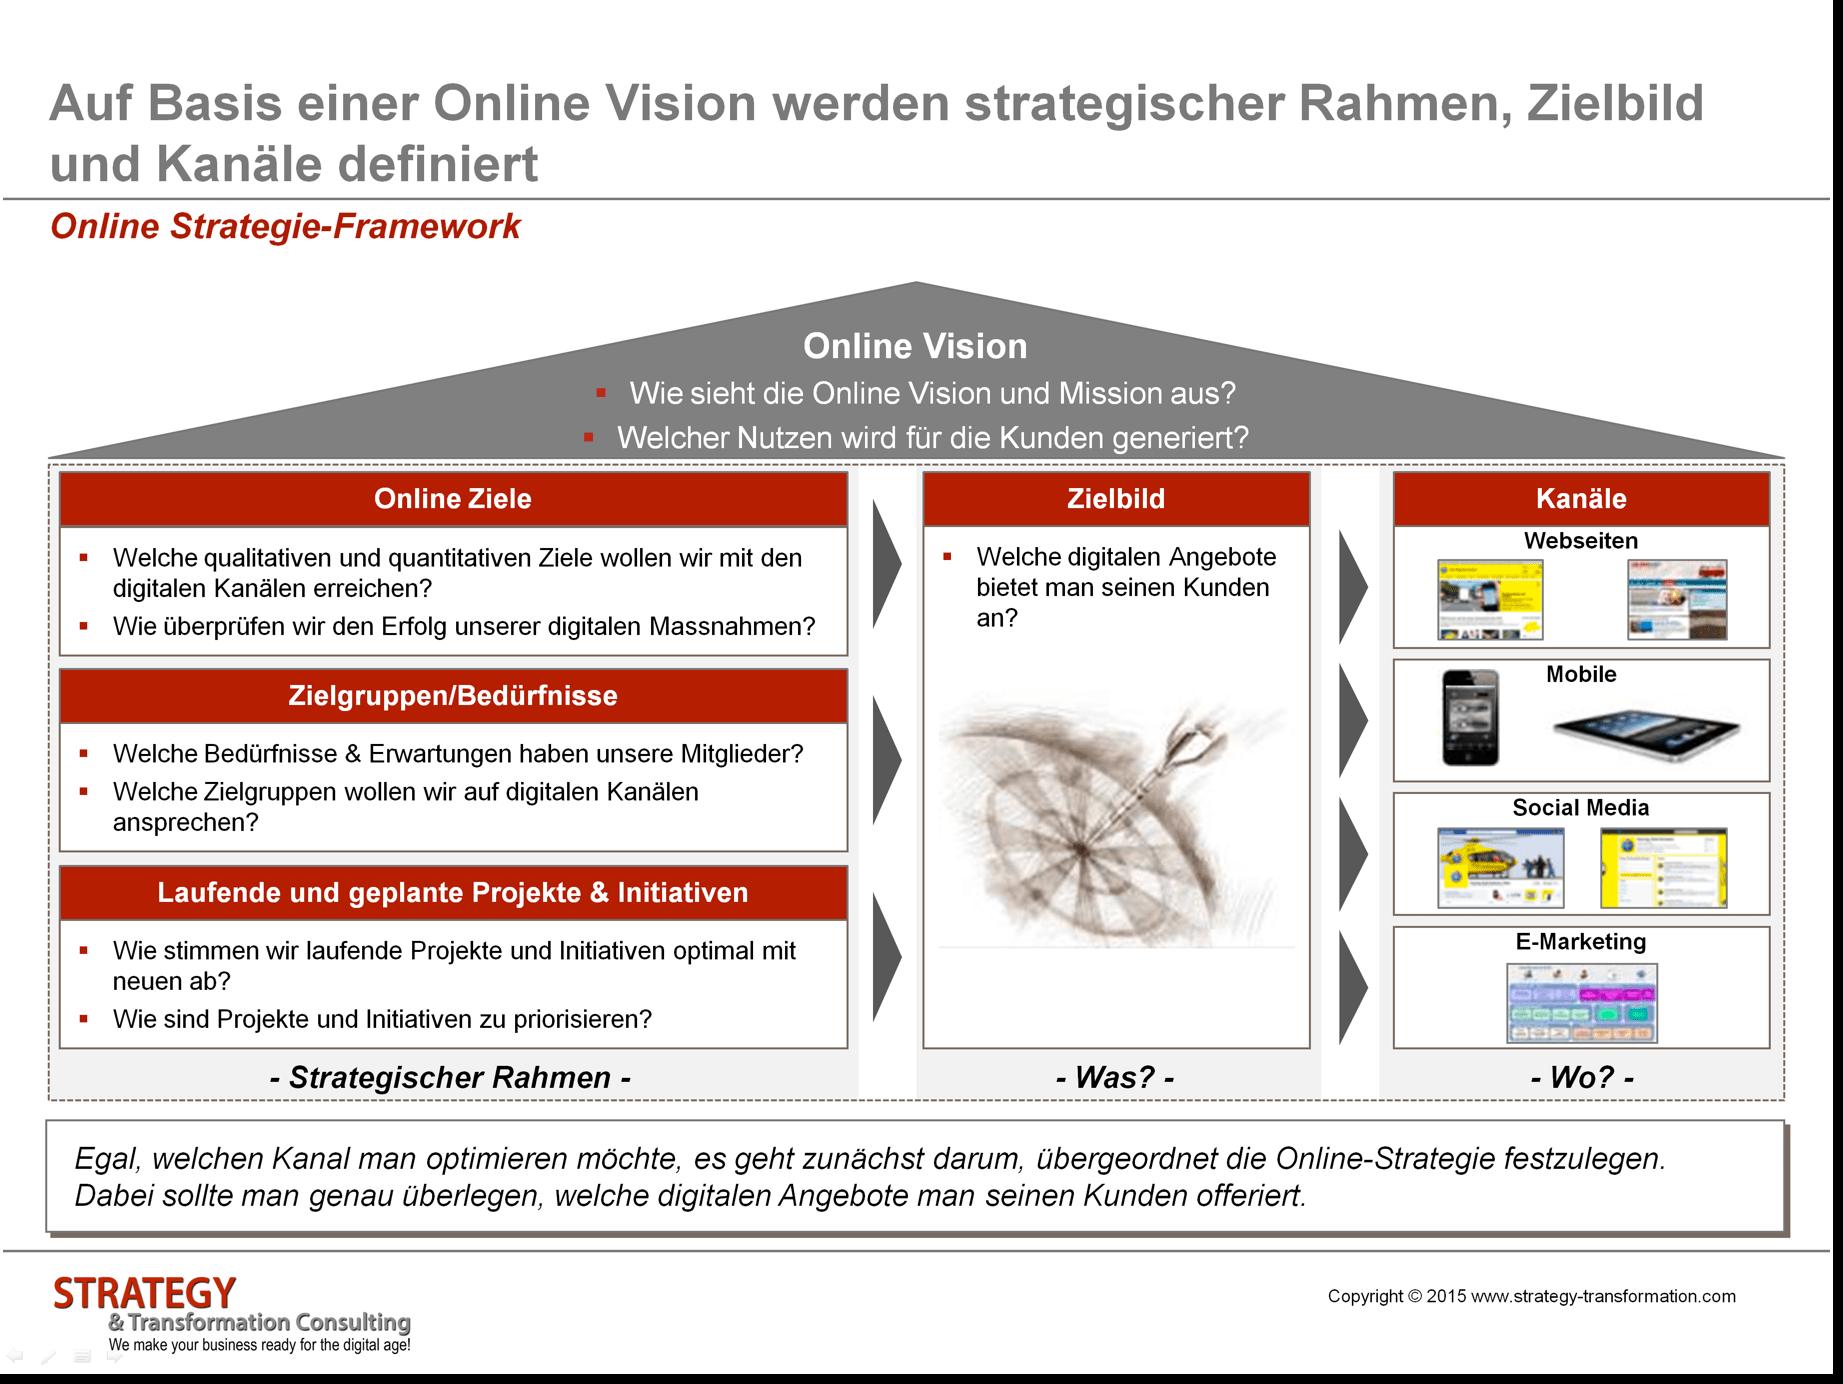 Online Strategie Framework